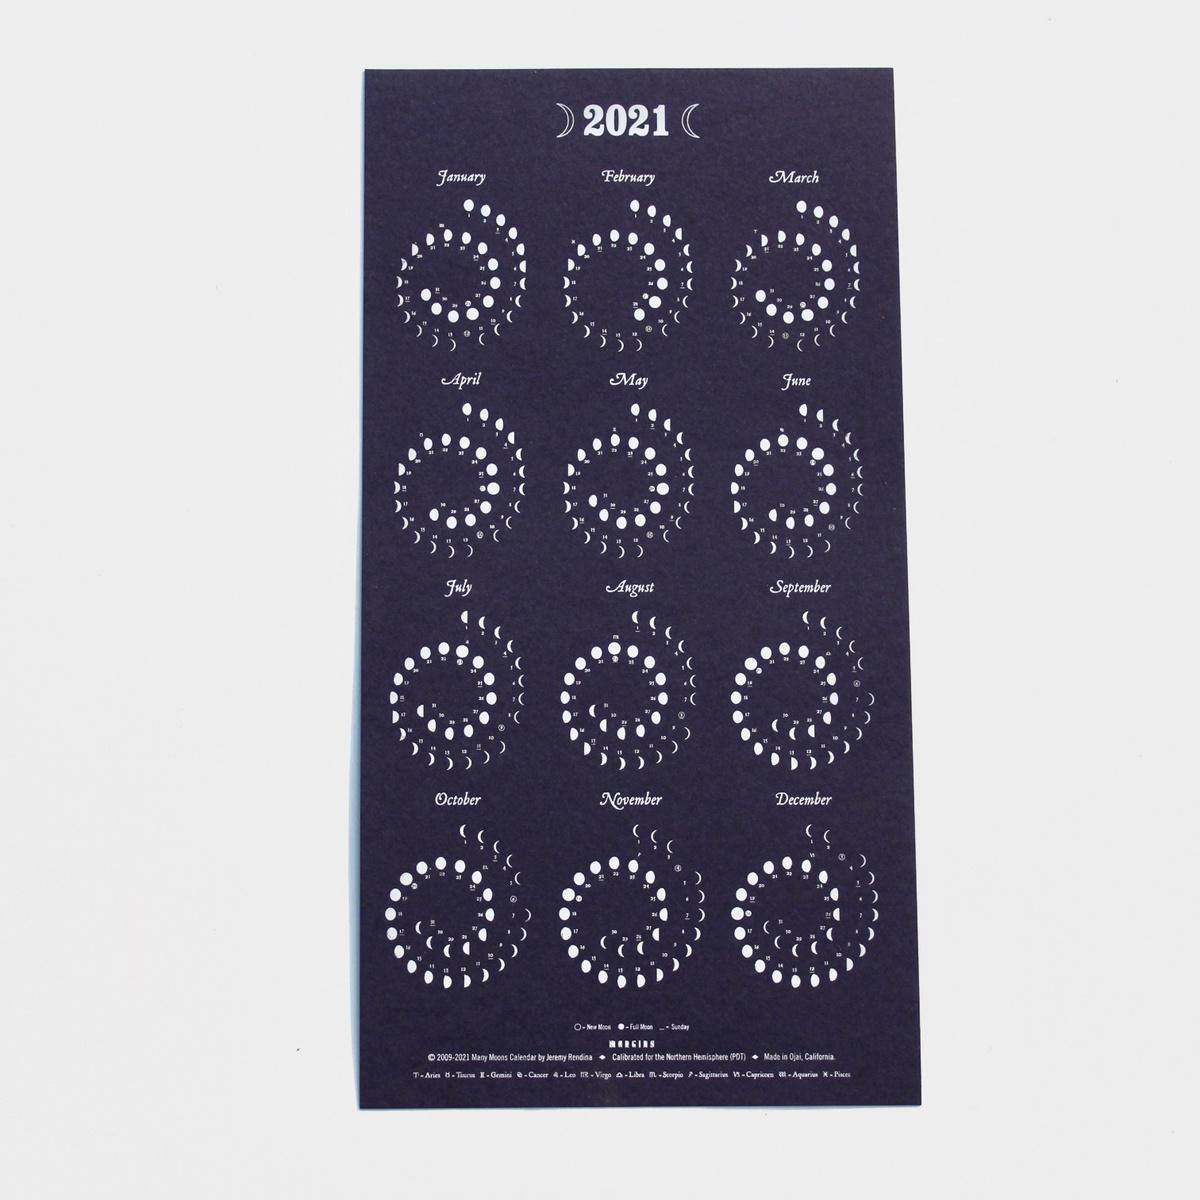 Margins Imprint 2021 Nightsky Moon Phase Calendar - Framed